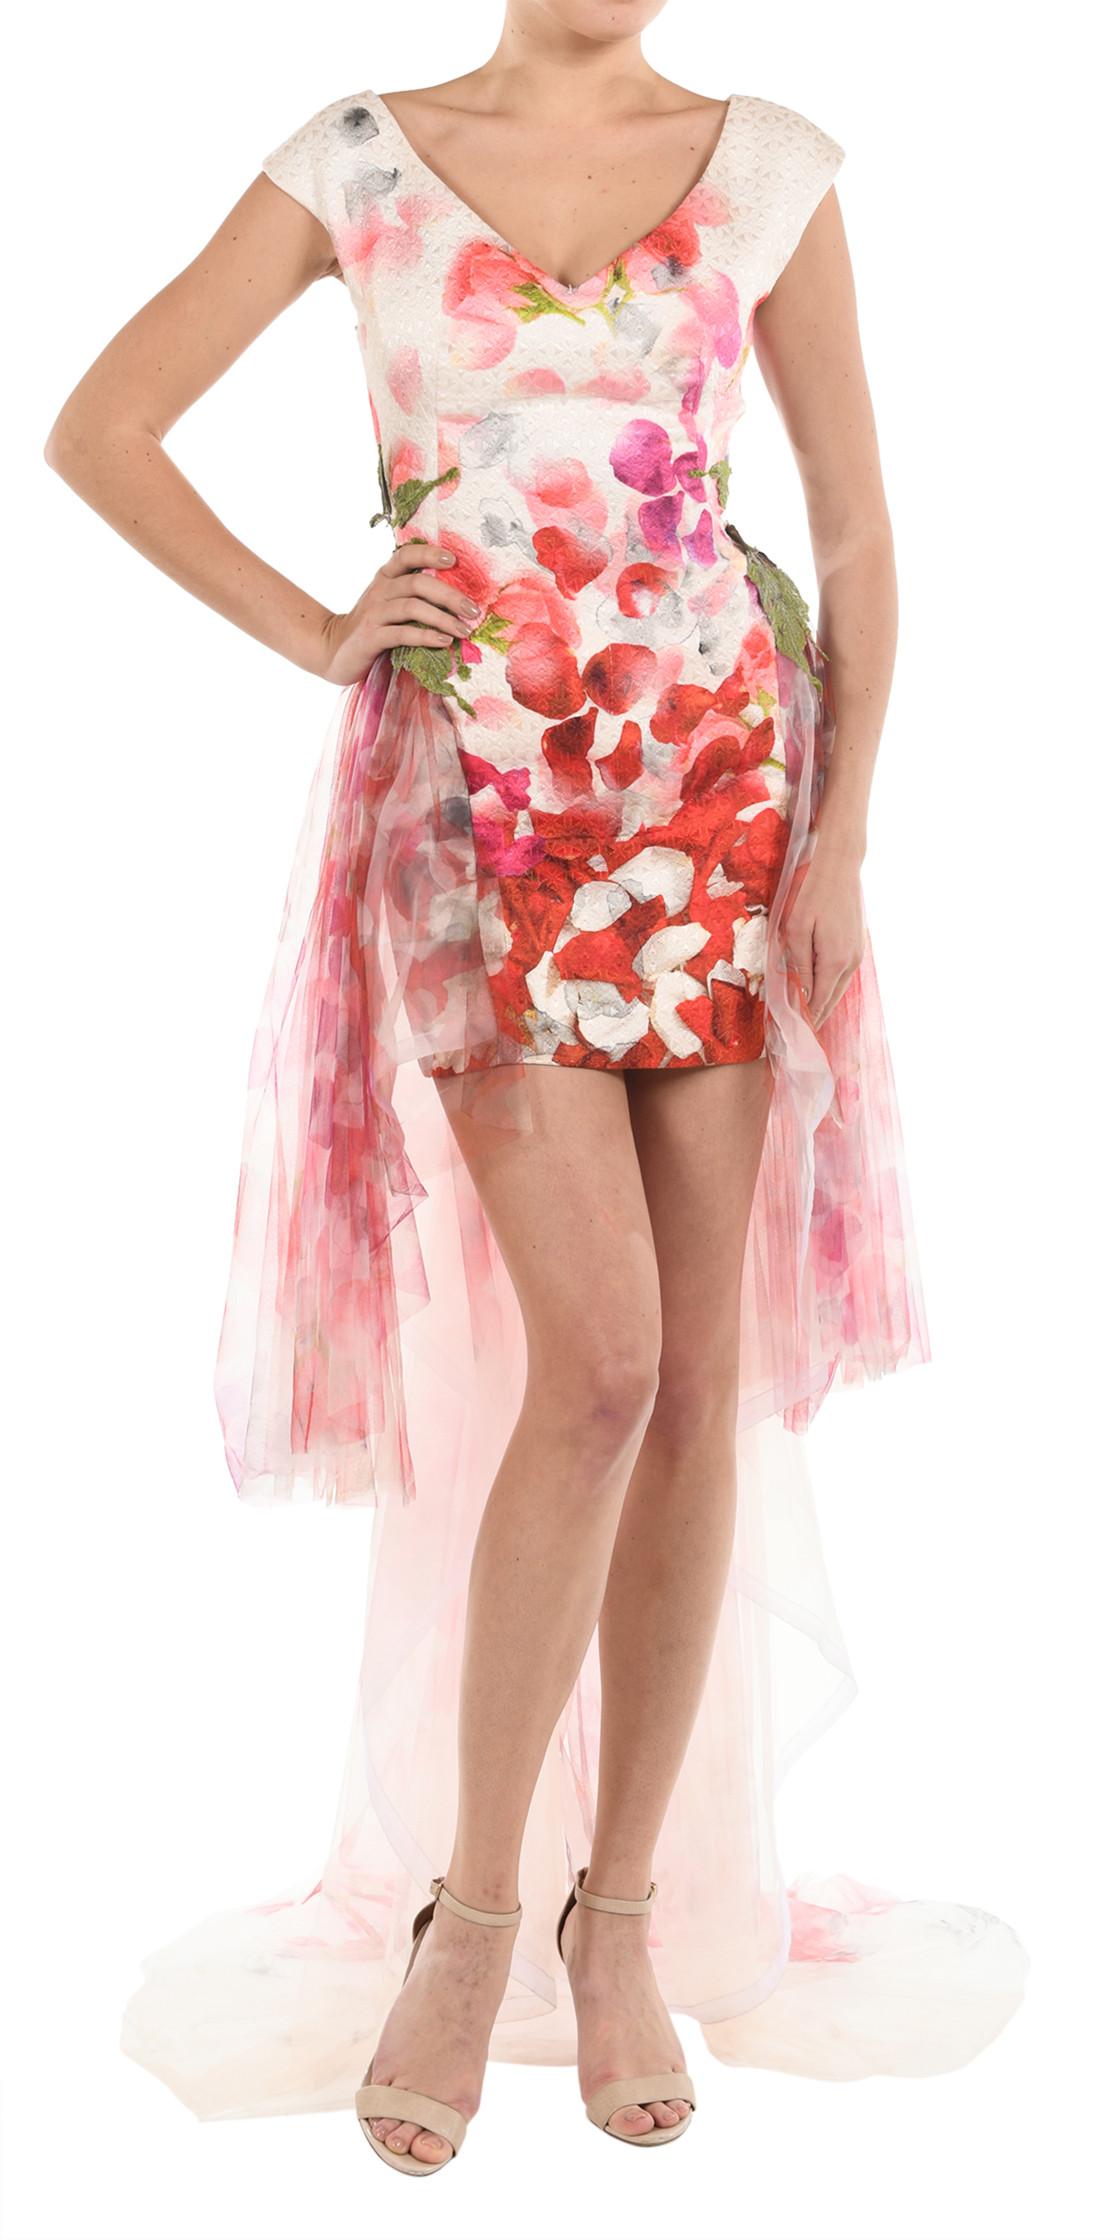 Gemy Maalouf floral gown | Formal Wedding Dresses Rental | Dubai ...